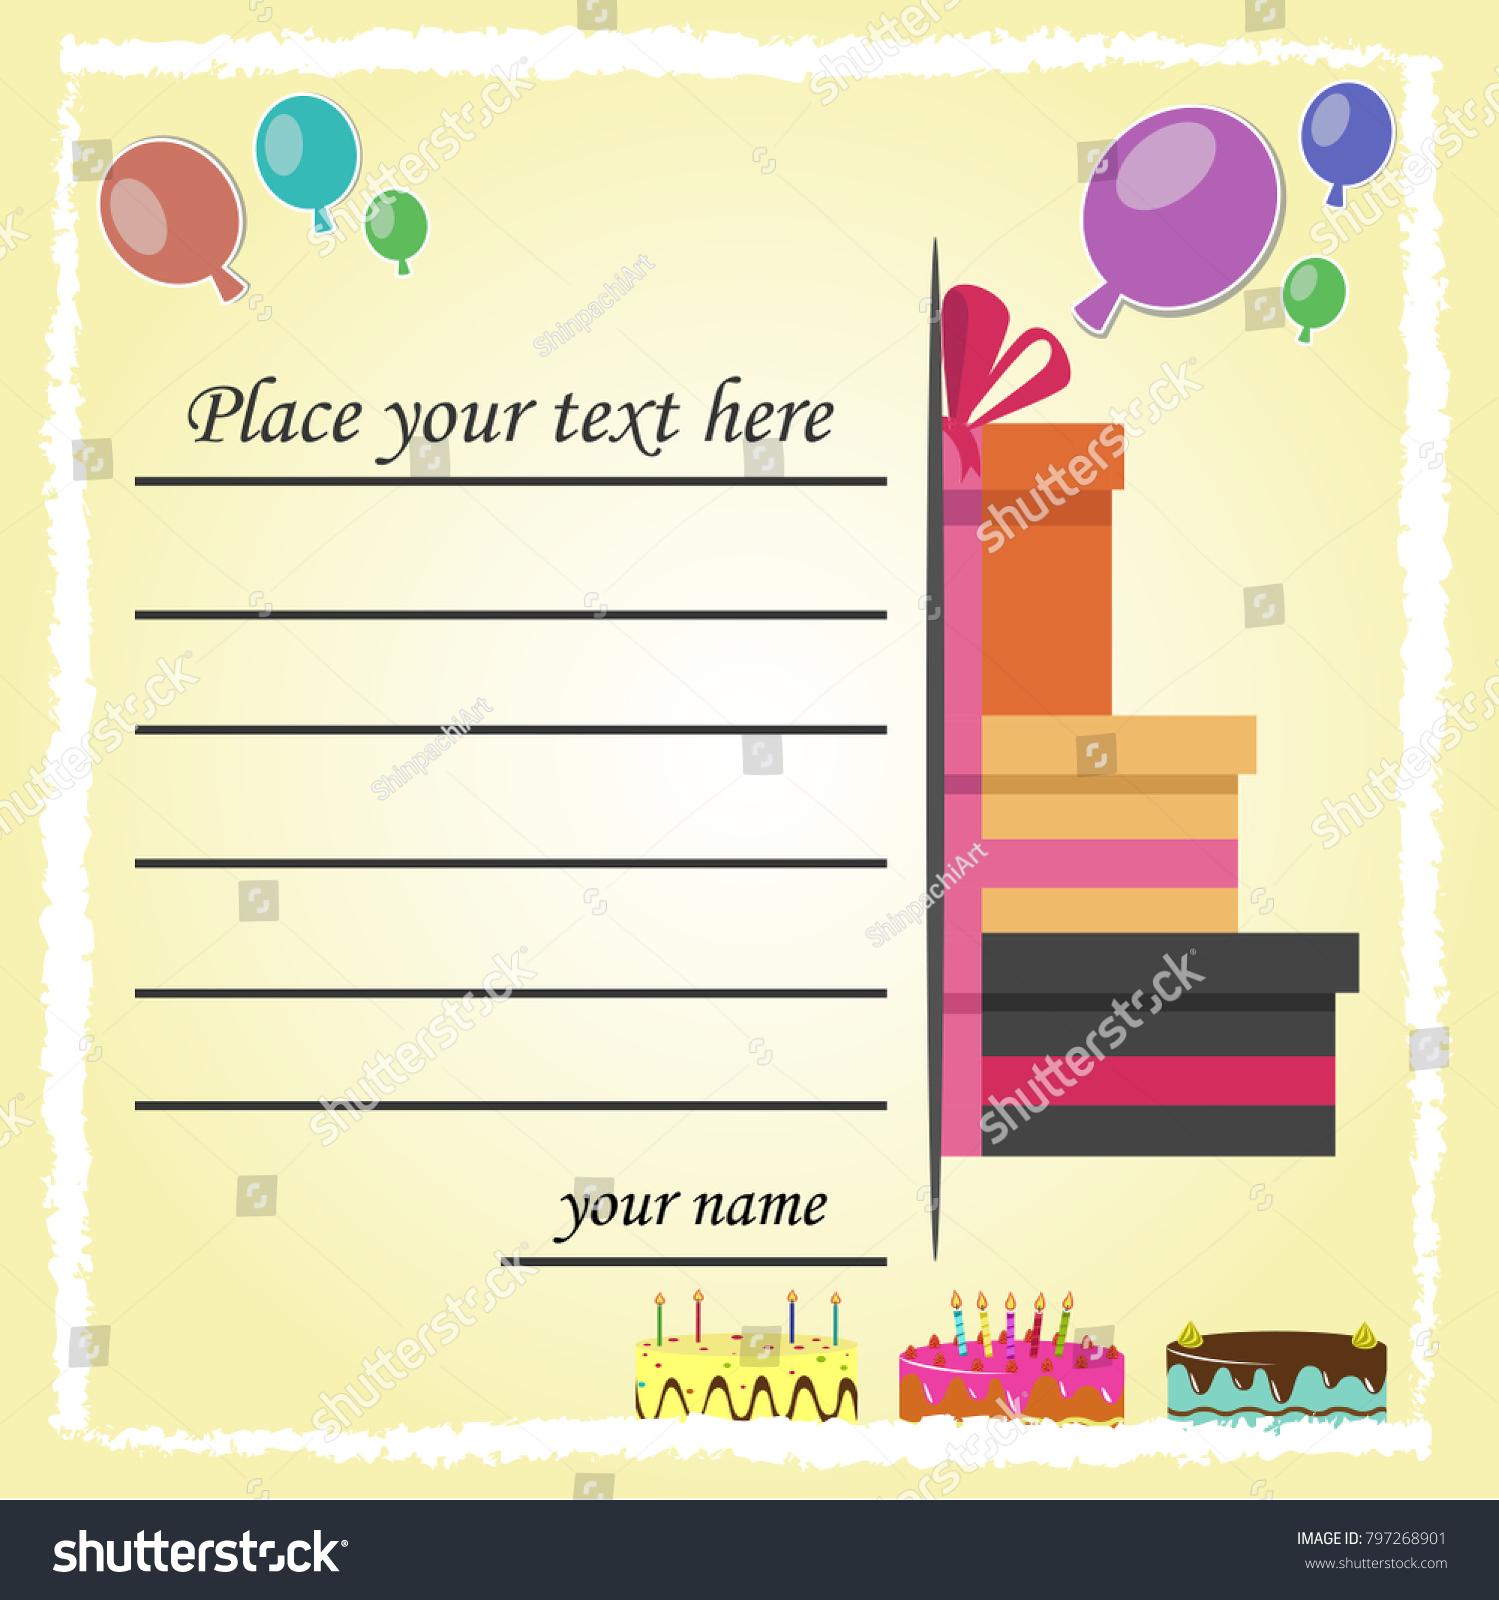 Happy birthday invitation card design cake stock vector 797268901 happy birthday invitation card design with cake gift box balloons and text flat stopboris Gallery